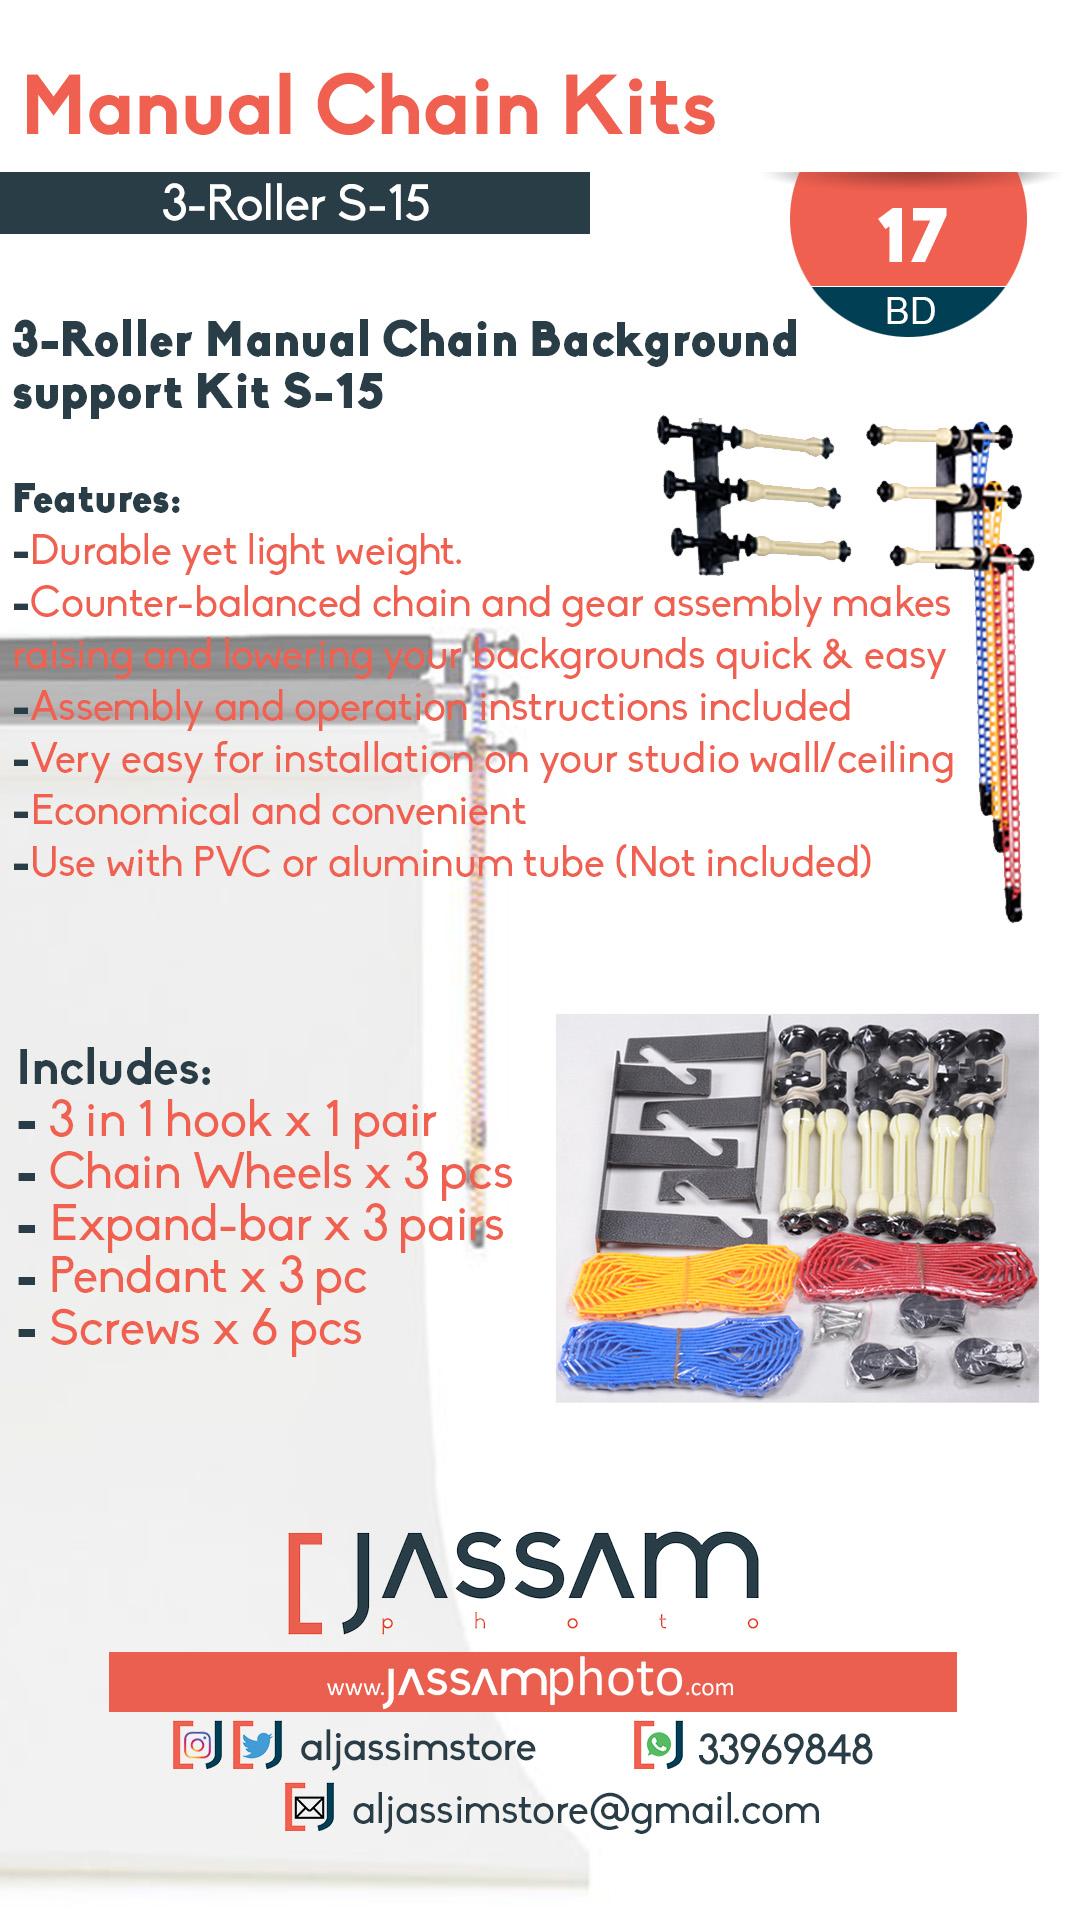 3-Roller Manual Chain Kit S-15